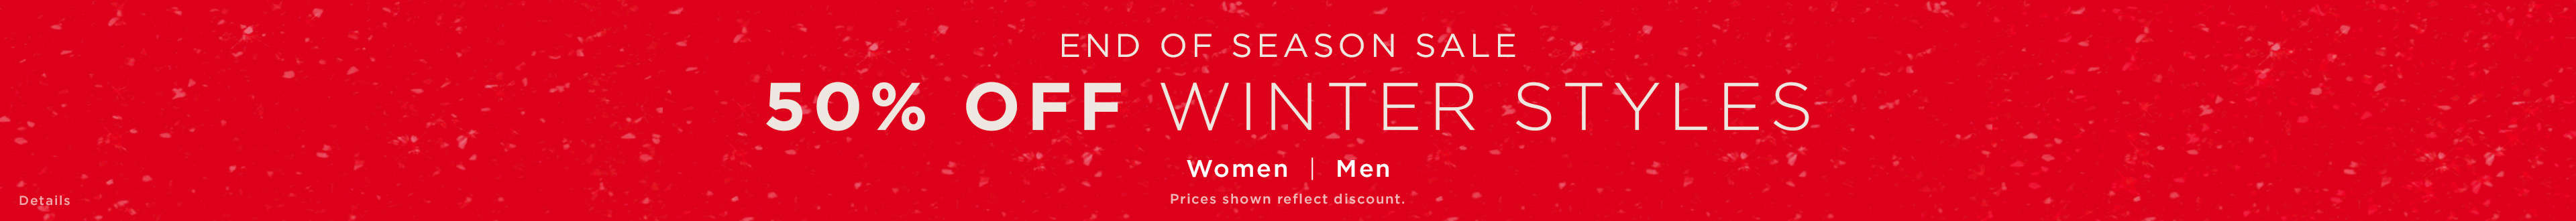 50% off winter styles